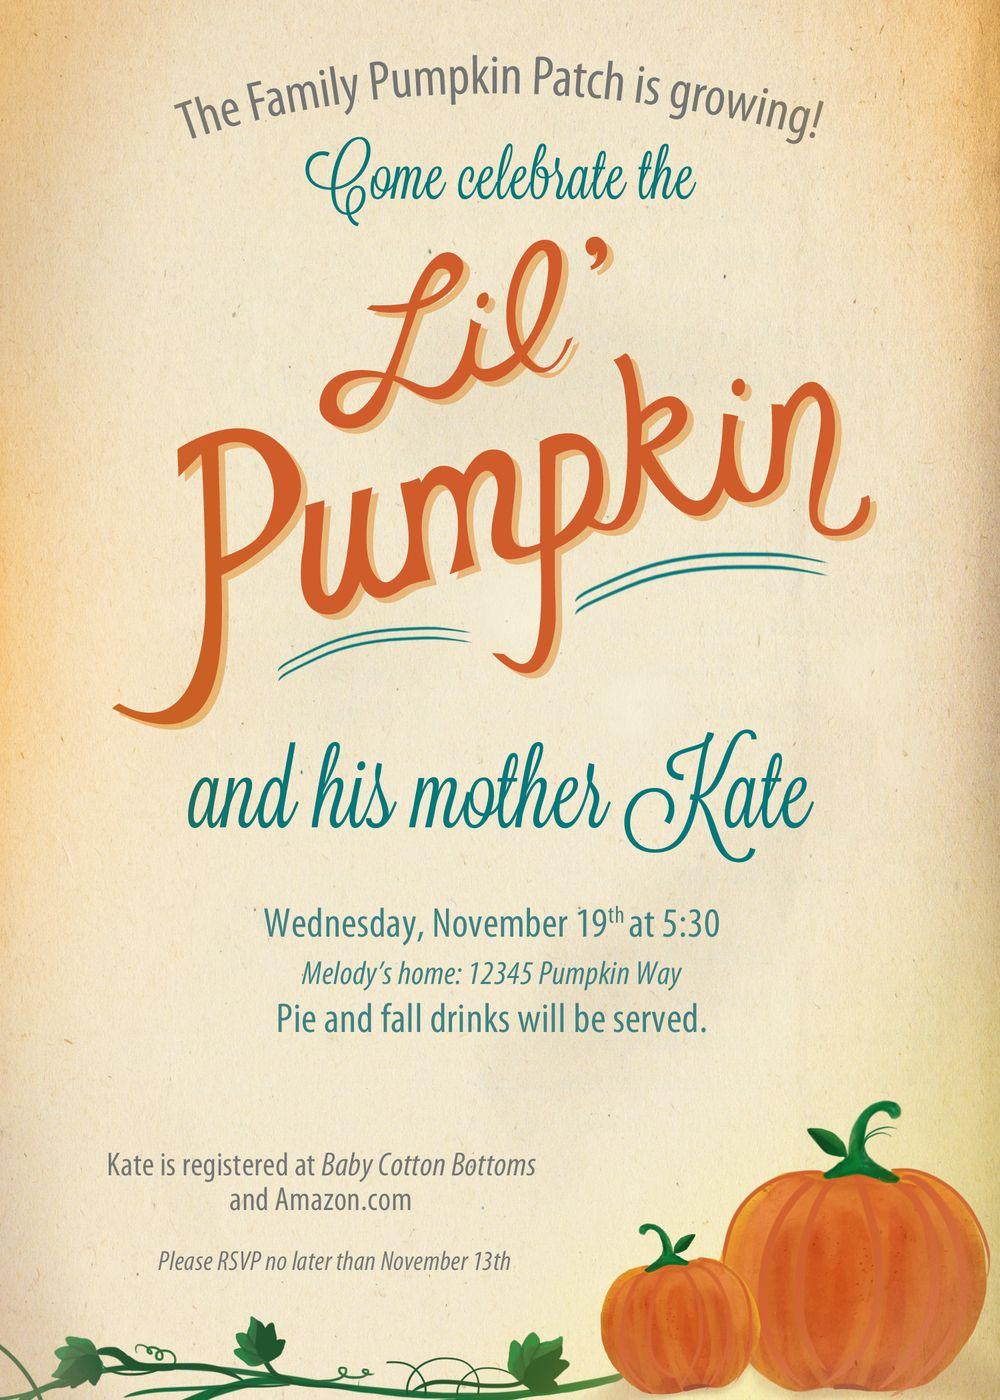 Lil Pumpkin Baby Shower Invitation   By Finicky Designs